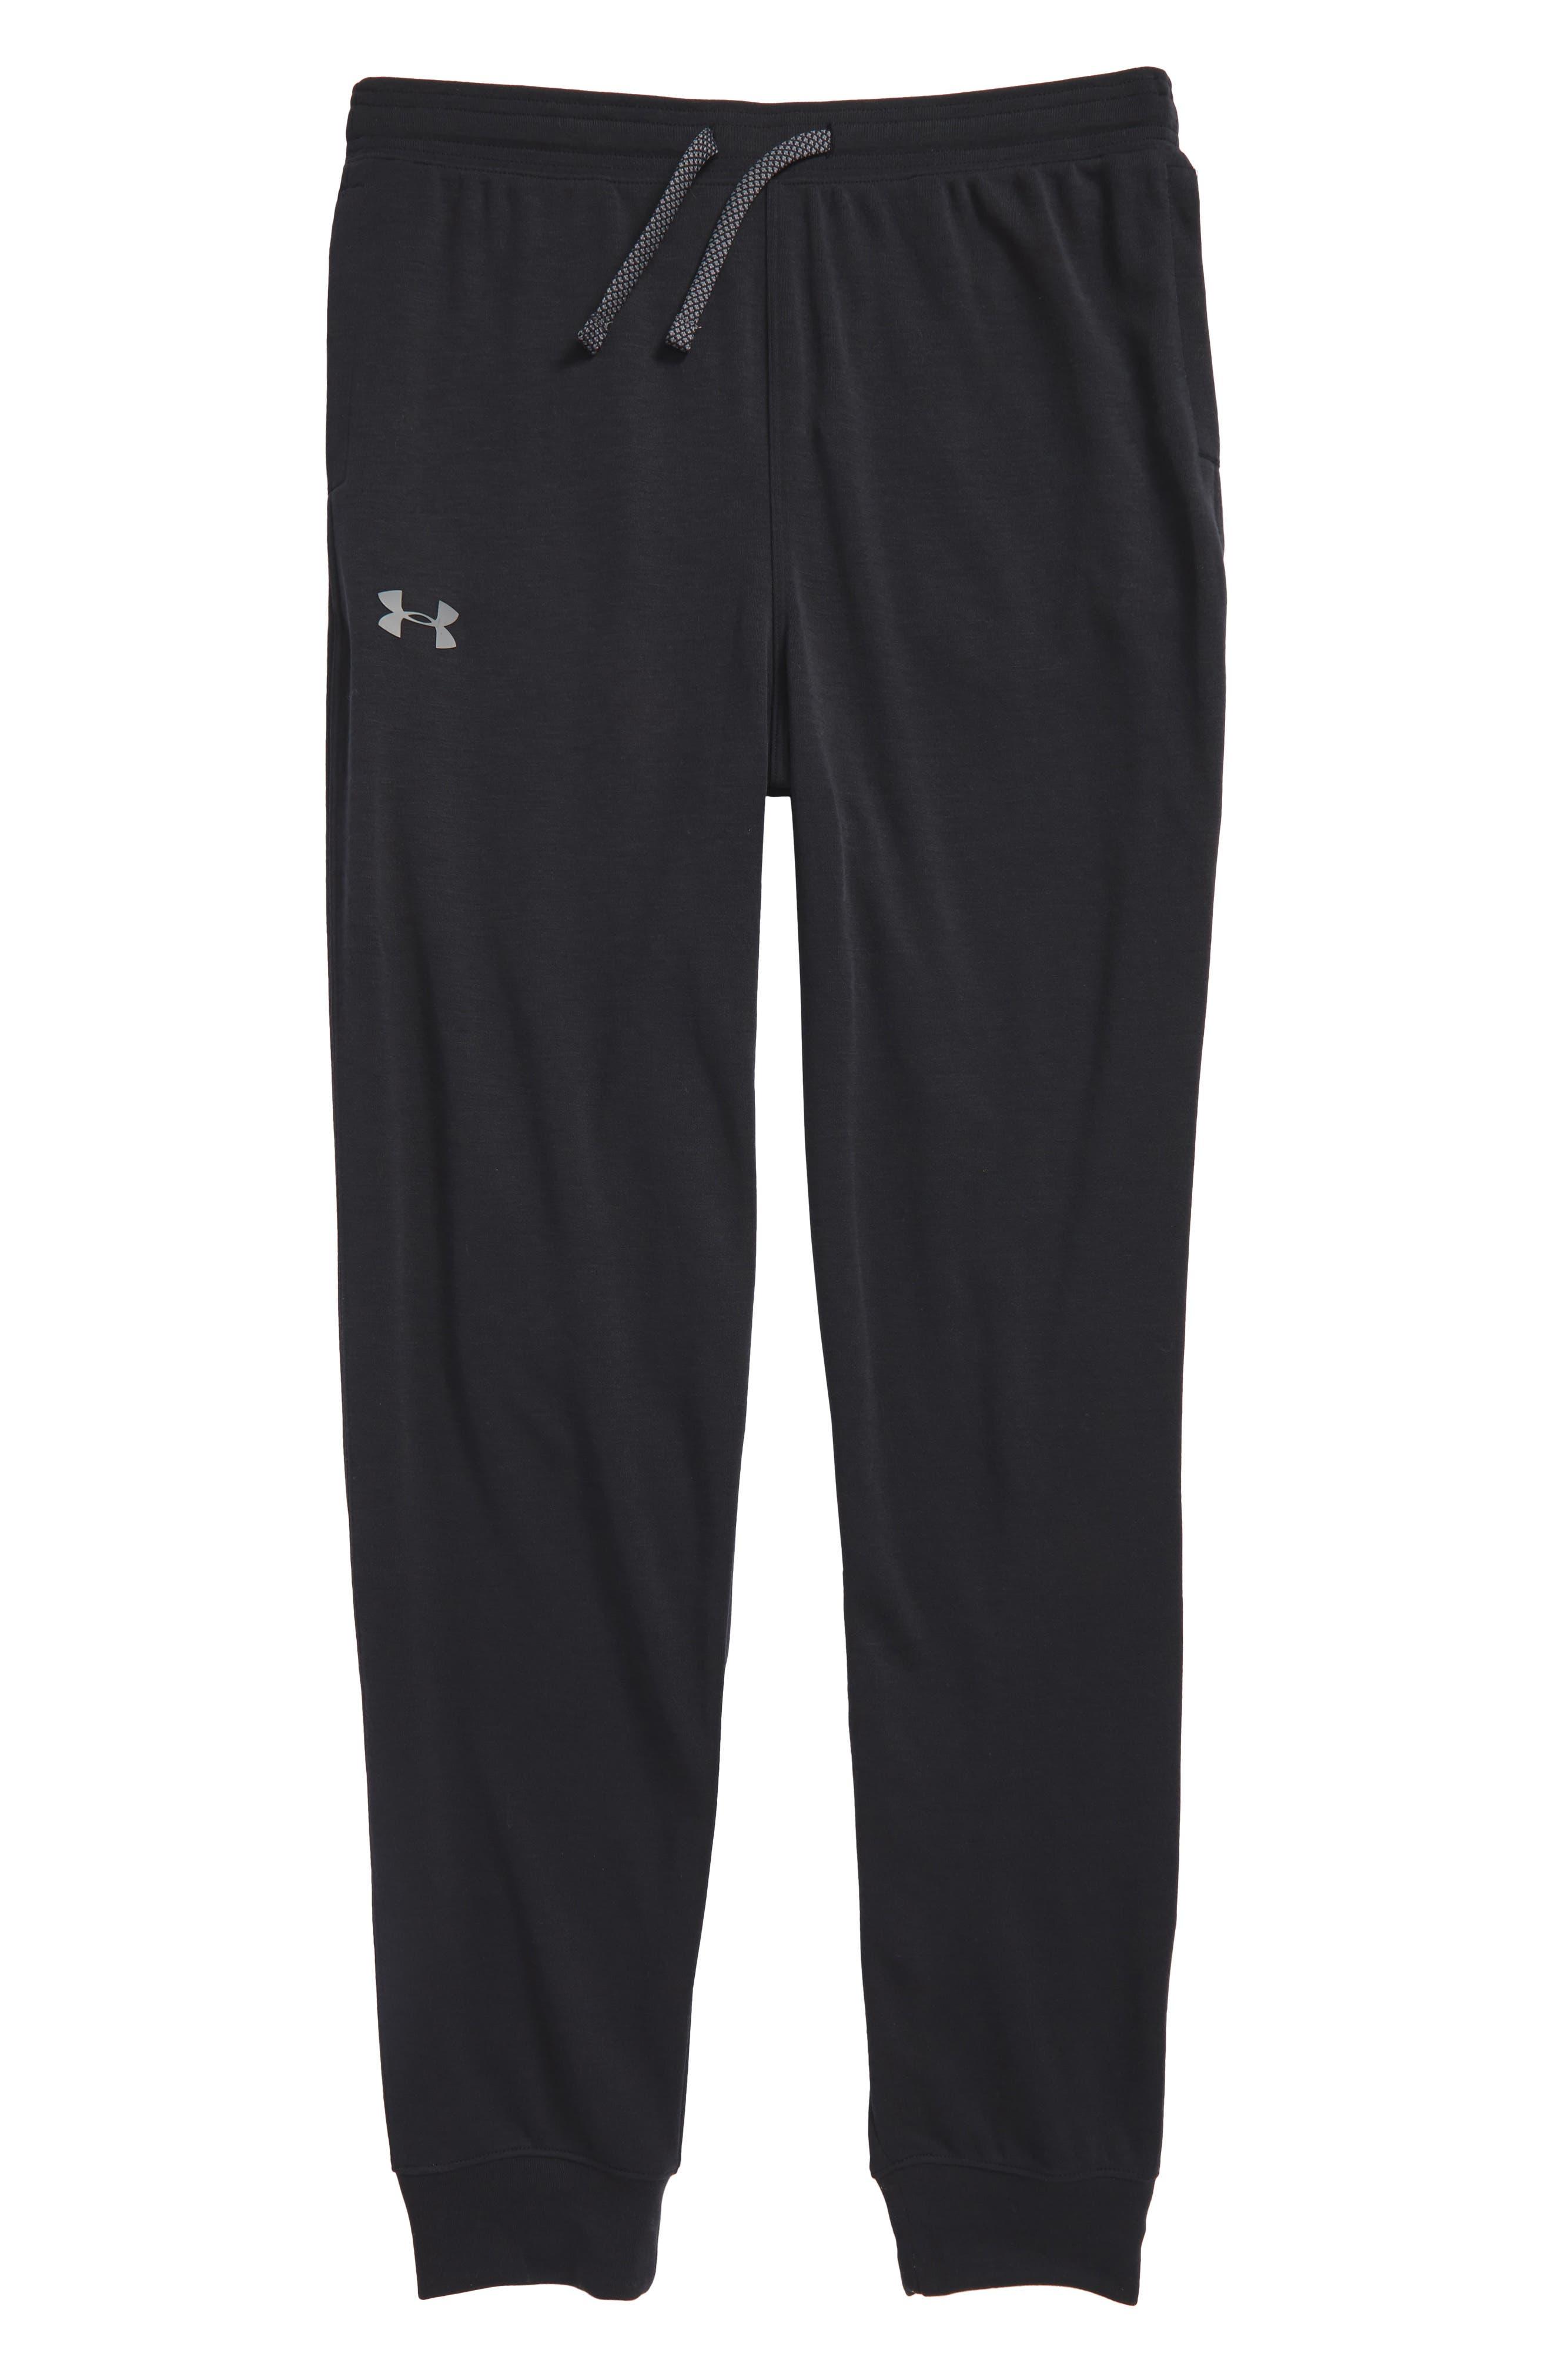 Threadborne Tech Sweatpants,                         Main,                         color, 001